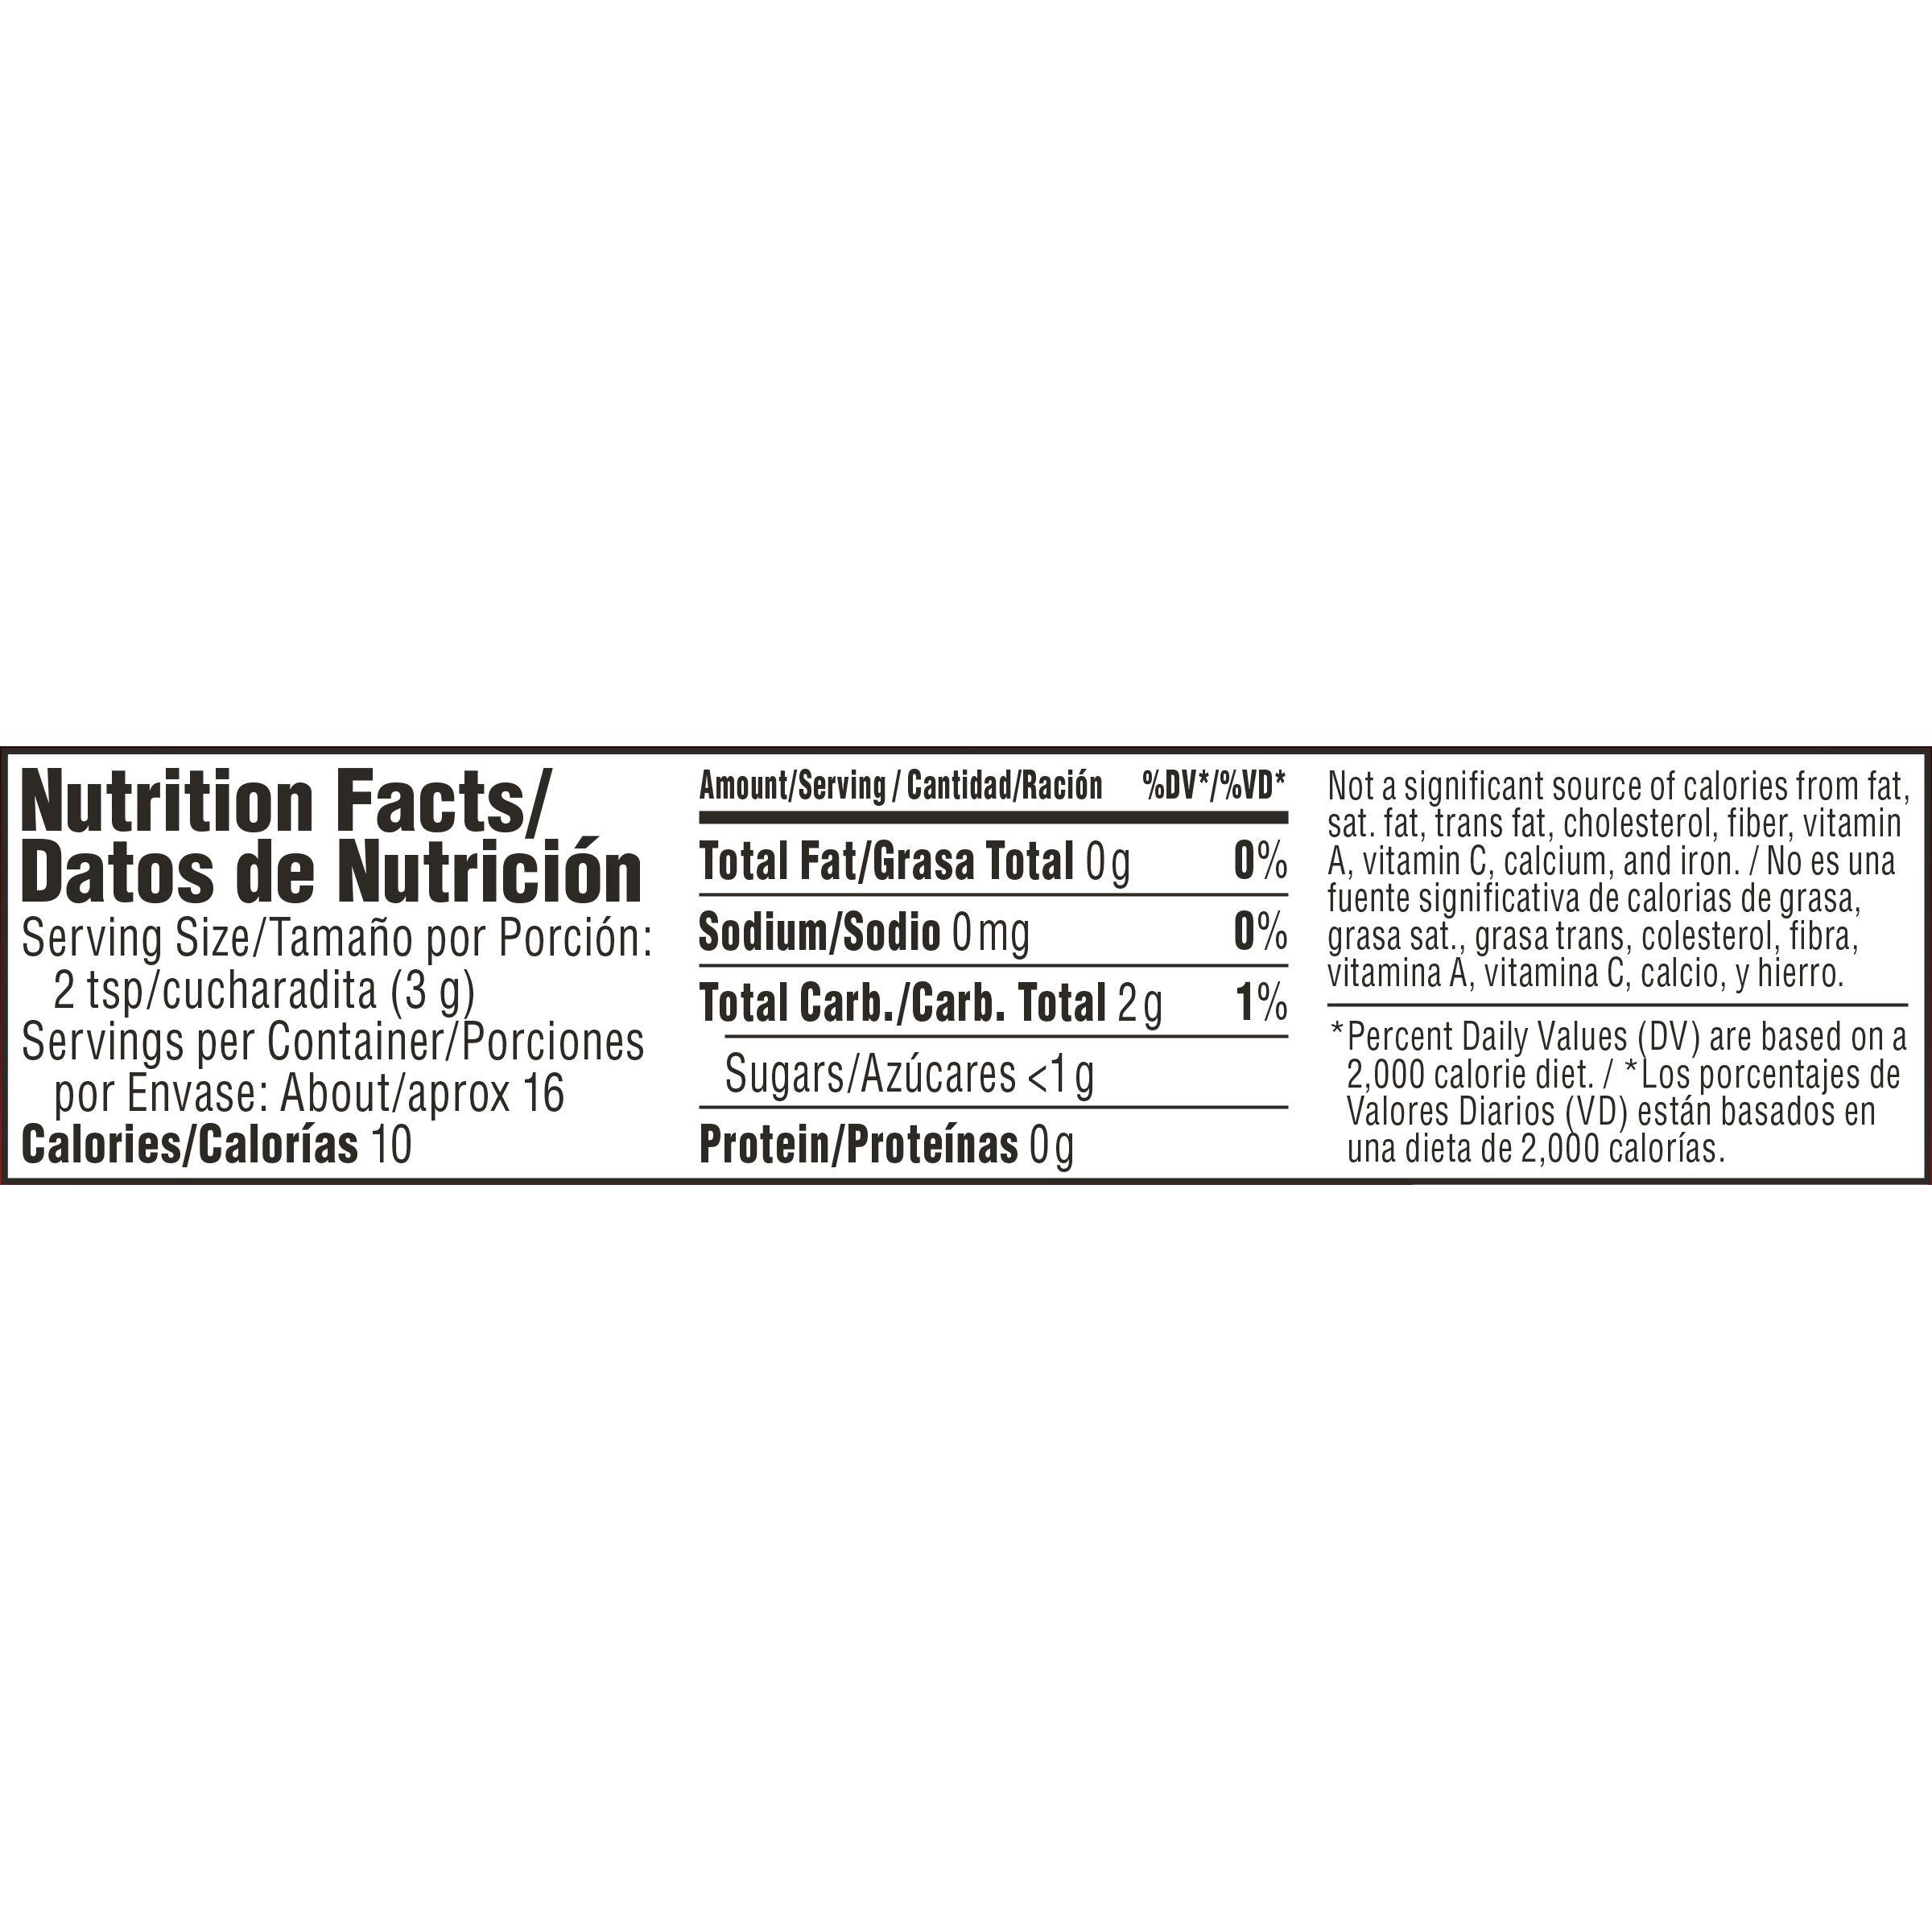 Nescafe Clasico Dark Roast Instant Coffee Nutrition Facts